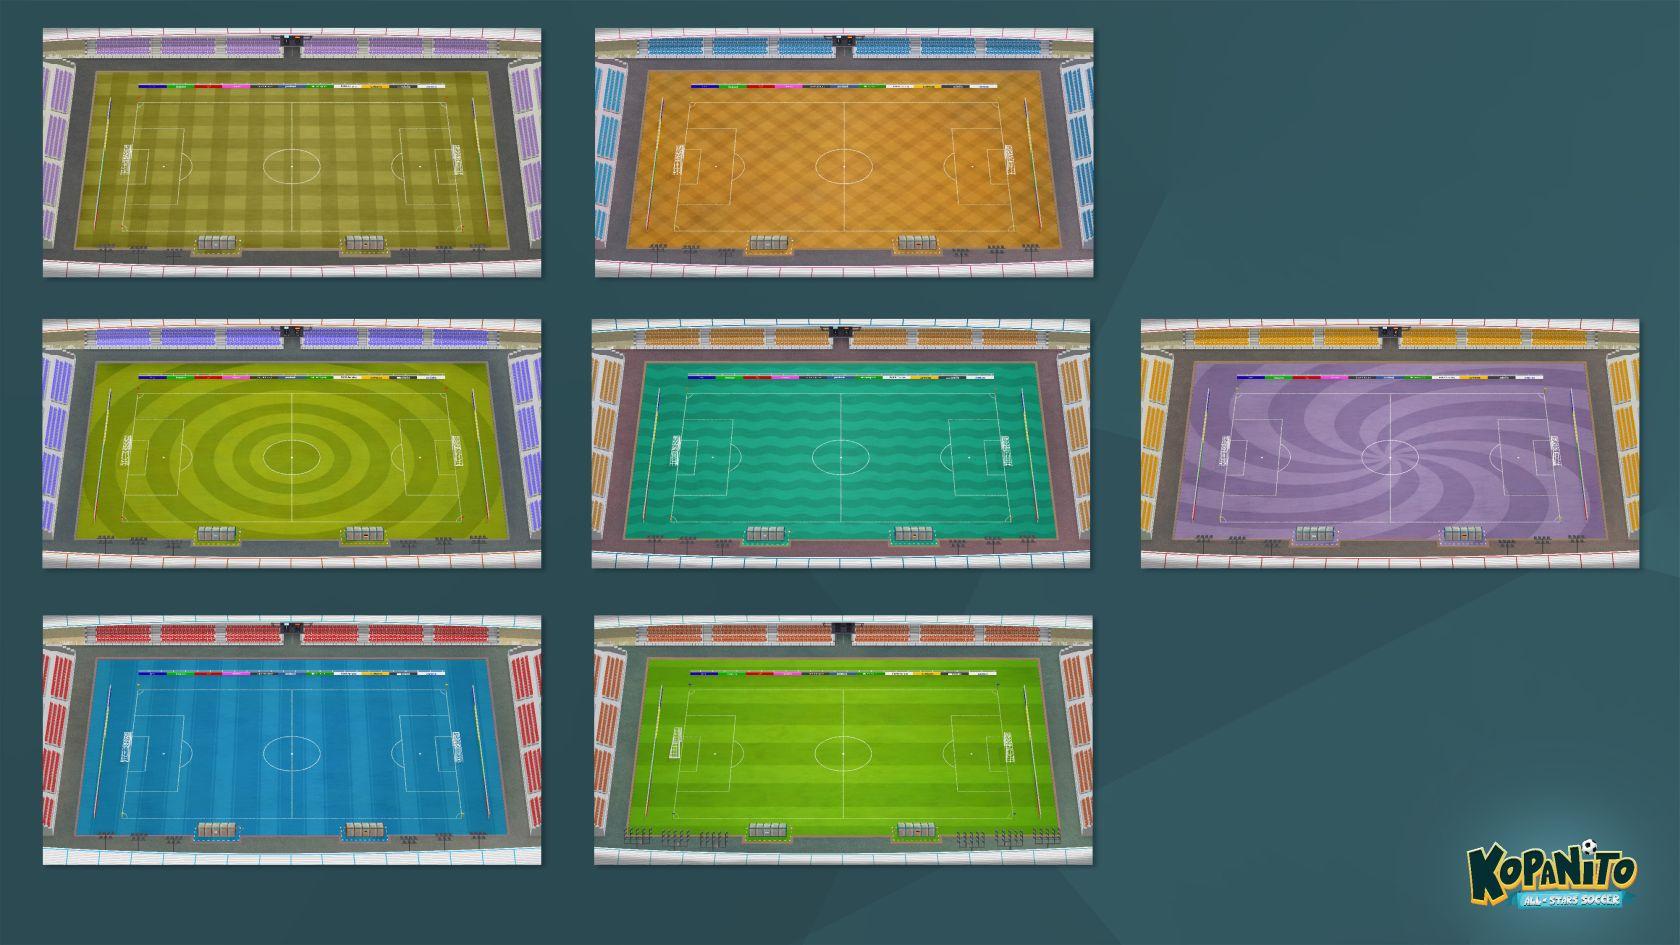 Kopanito All-Stars Soccer - Stadien